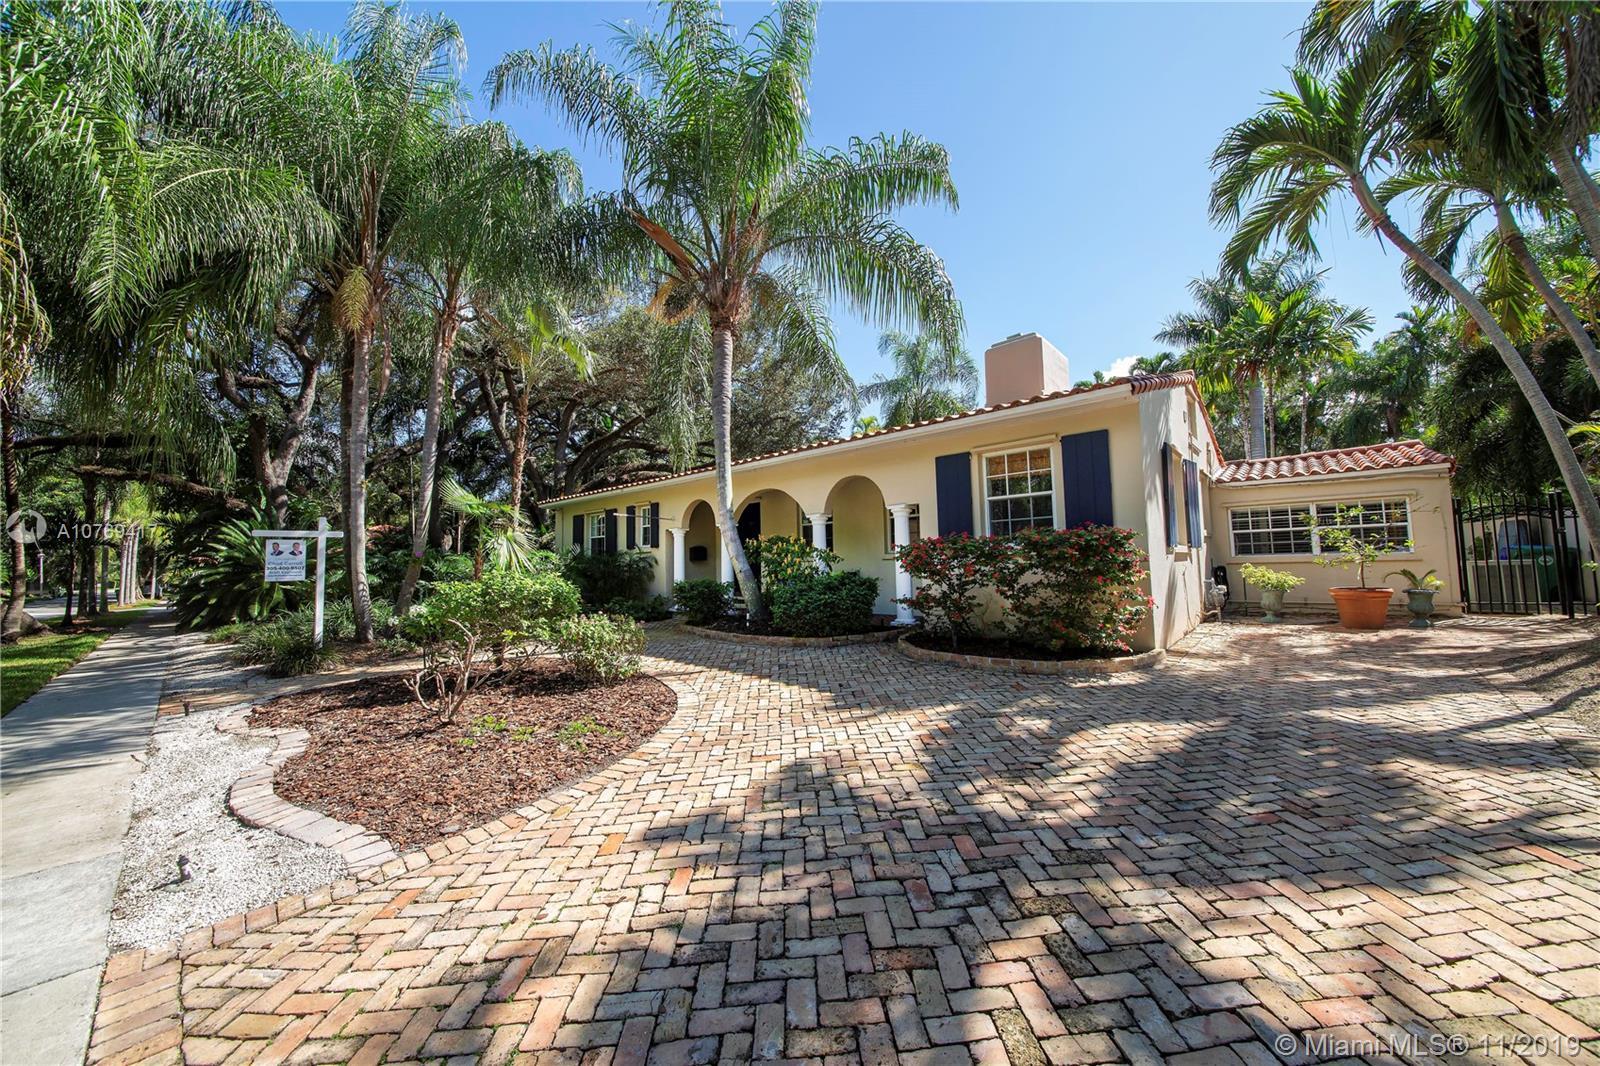 1624 Tigertail Ave - Miami, Florida